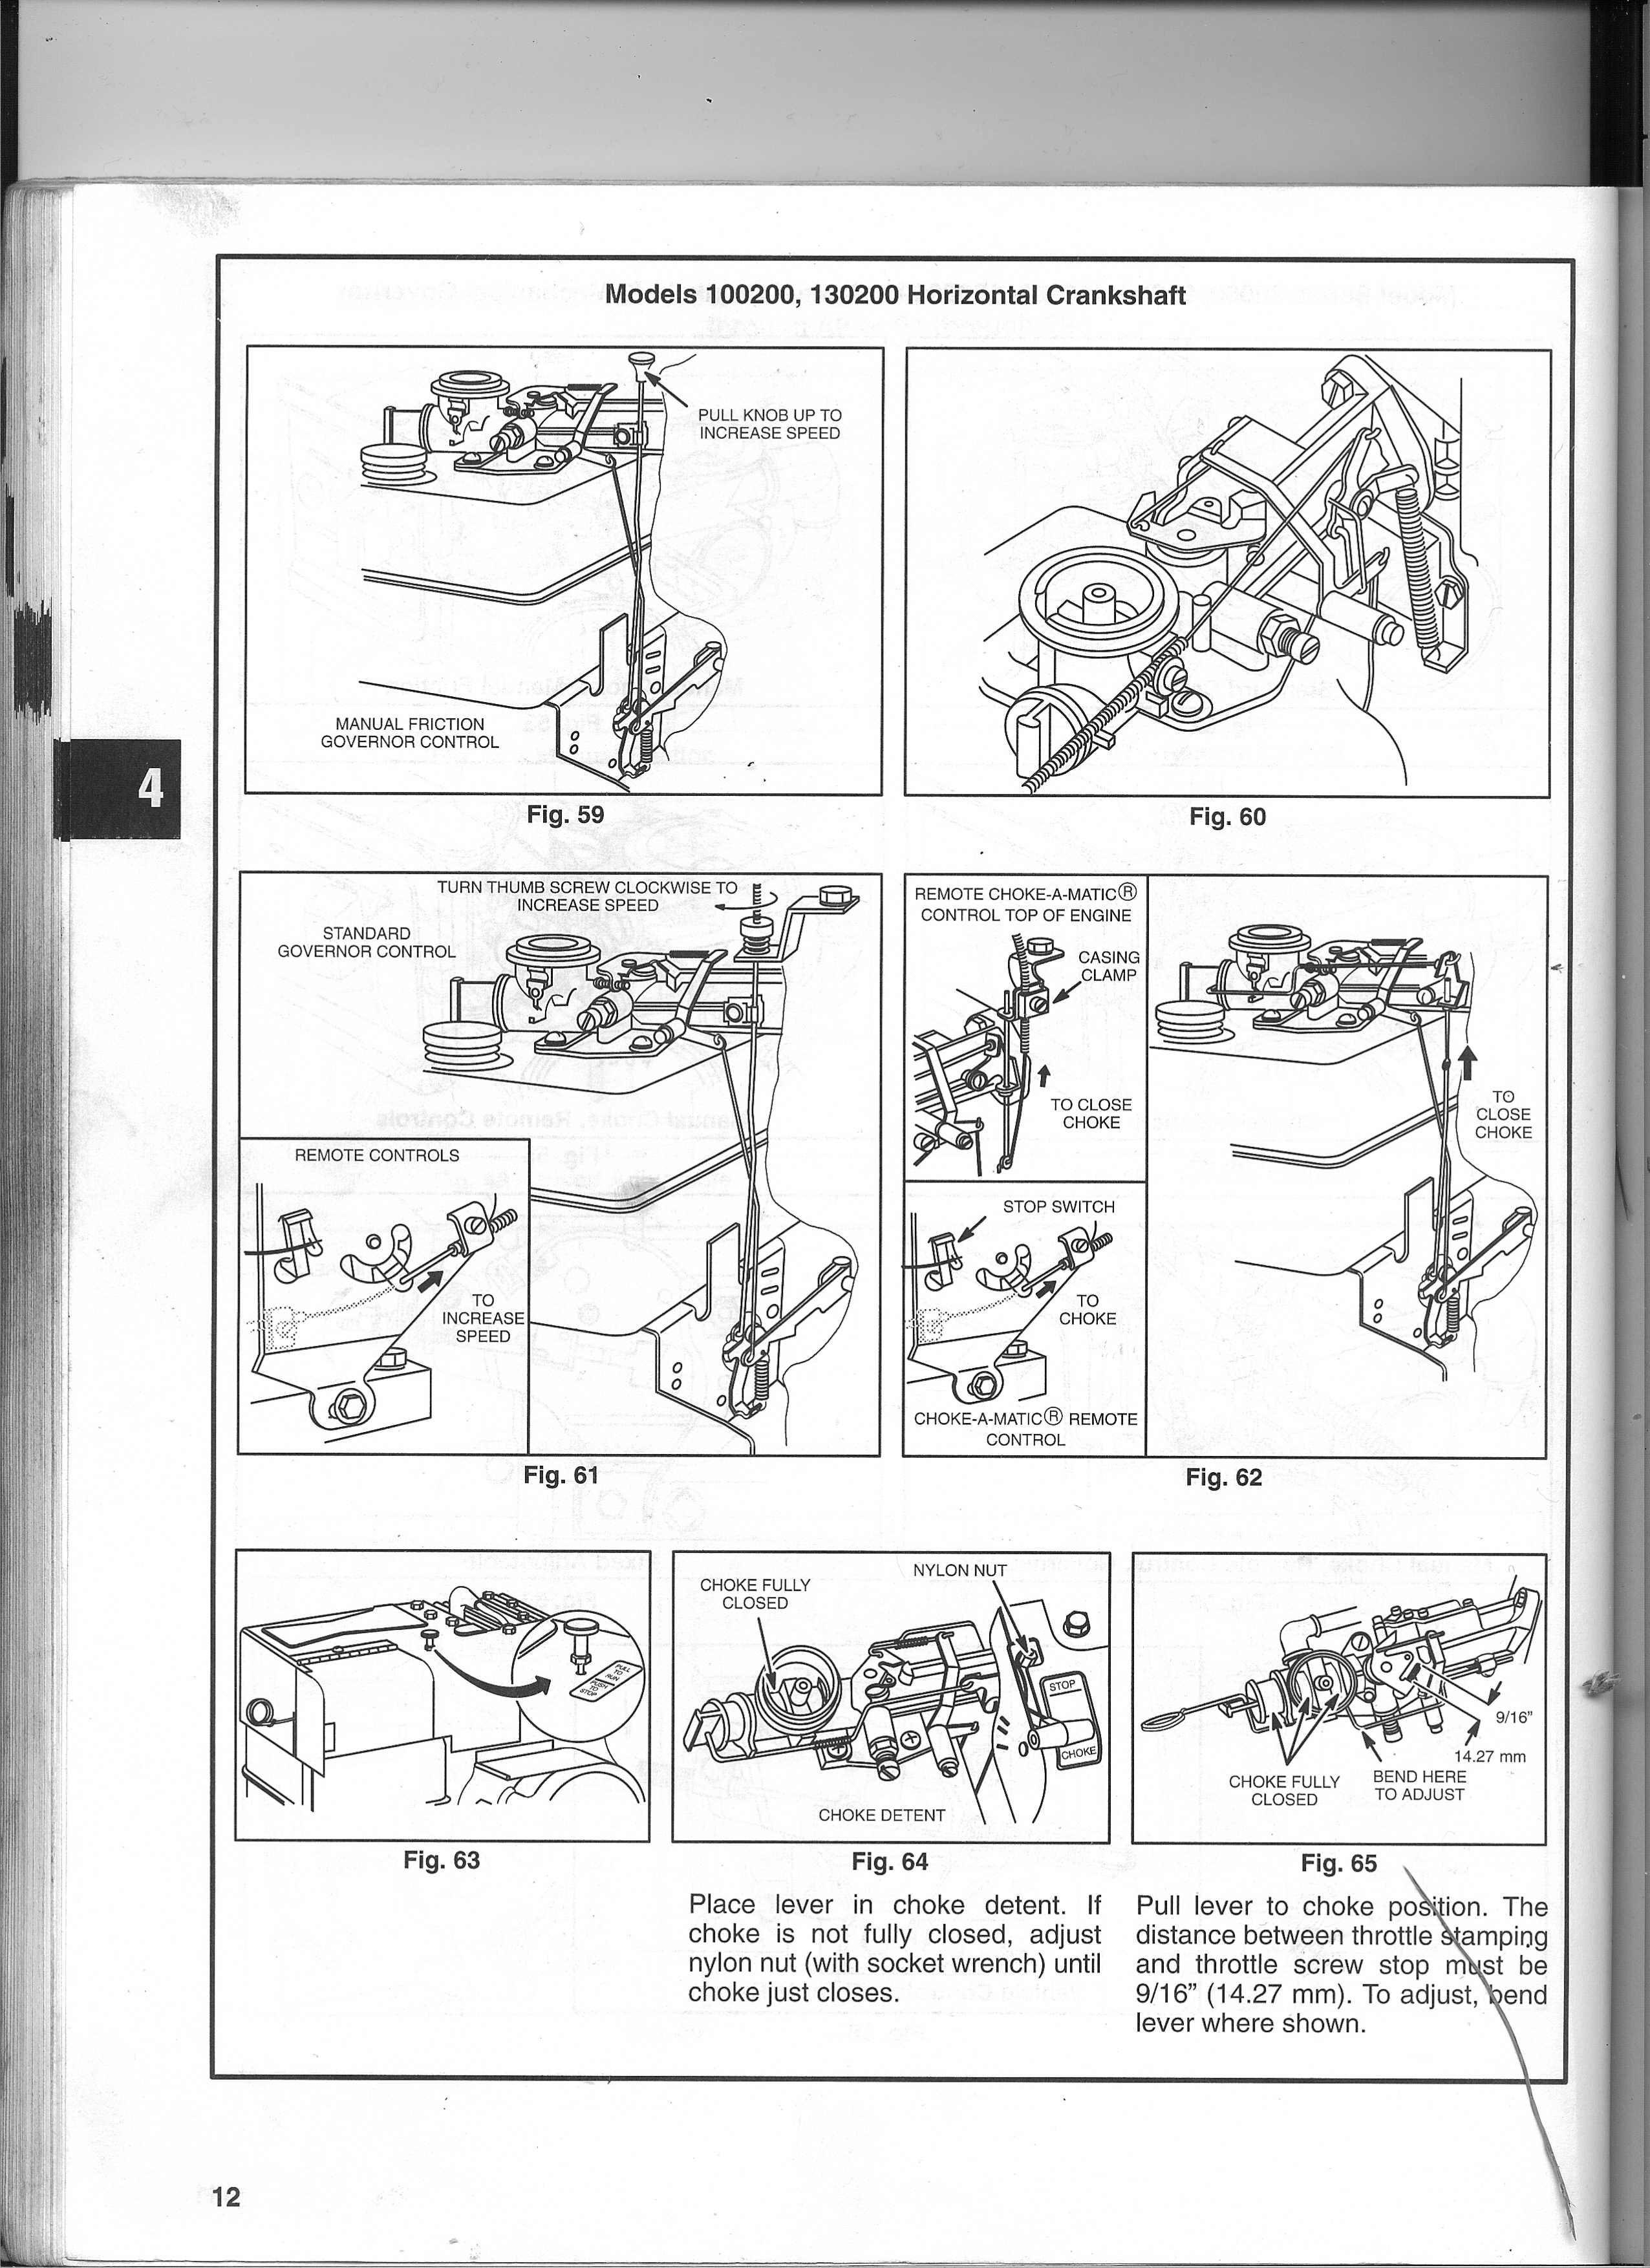 Briggs and Stratton 17 5 Hp Engine Diagram Stunning Briggs and Stratton Engine Breakdown Simple Wiring Of Briggs and Stratton 17 5 Hp Engine Diagram